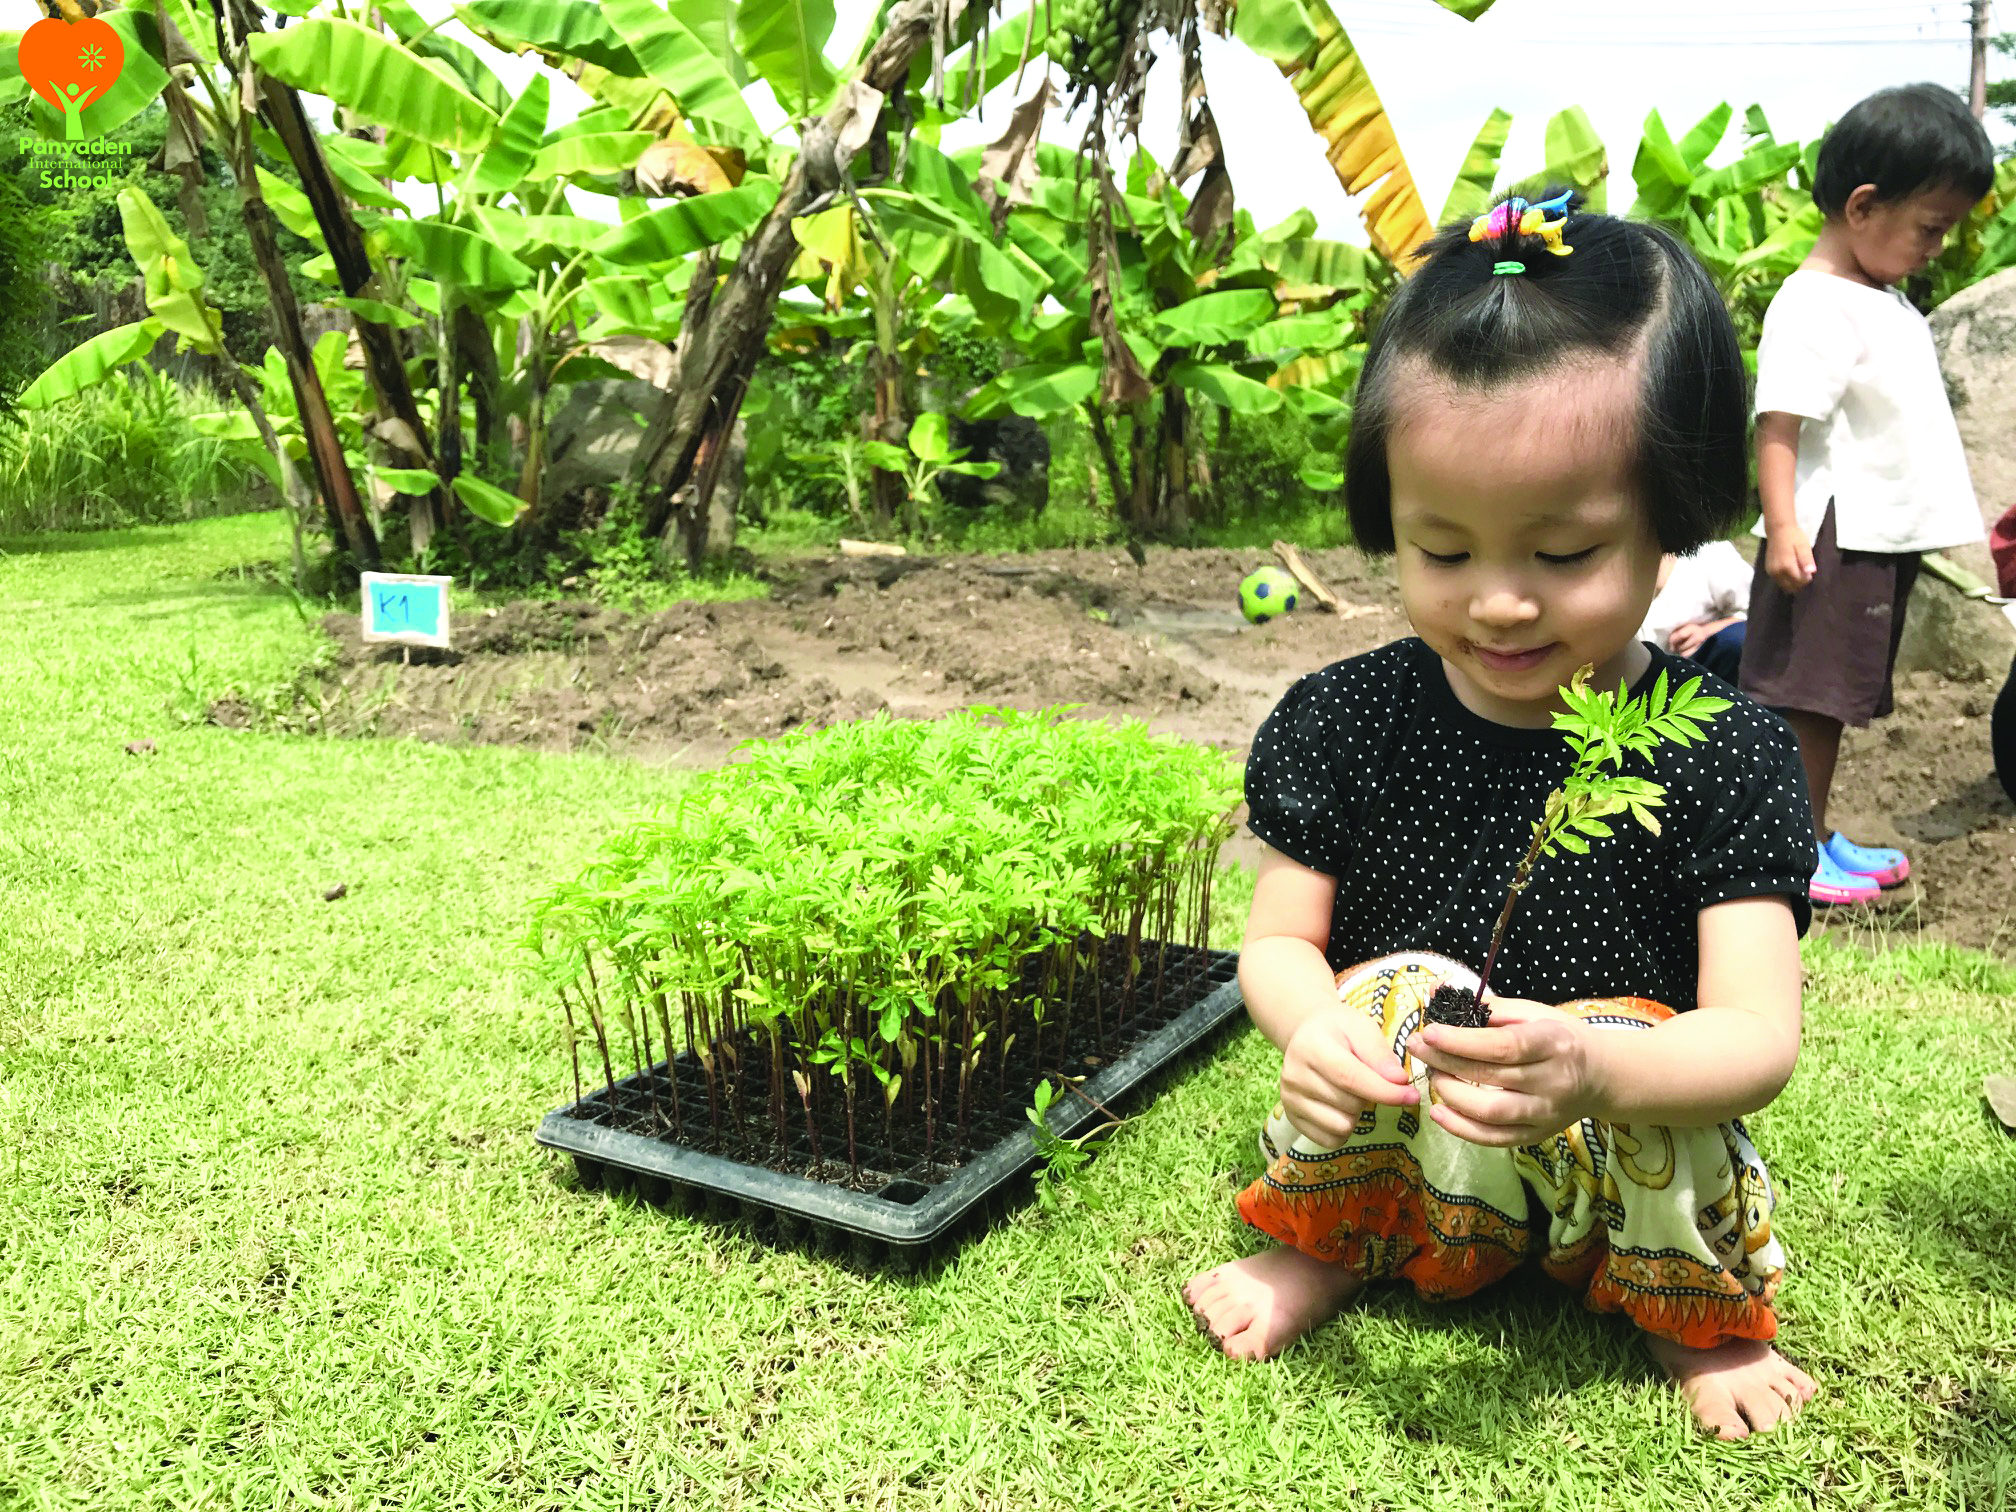 Panyaden Kindergarten 1 planting marigold flowers as a tribute to King Rama IX